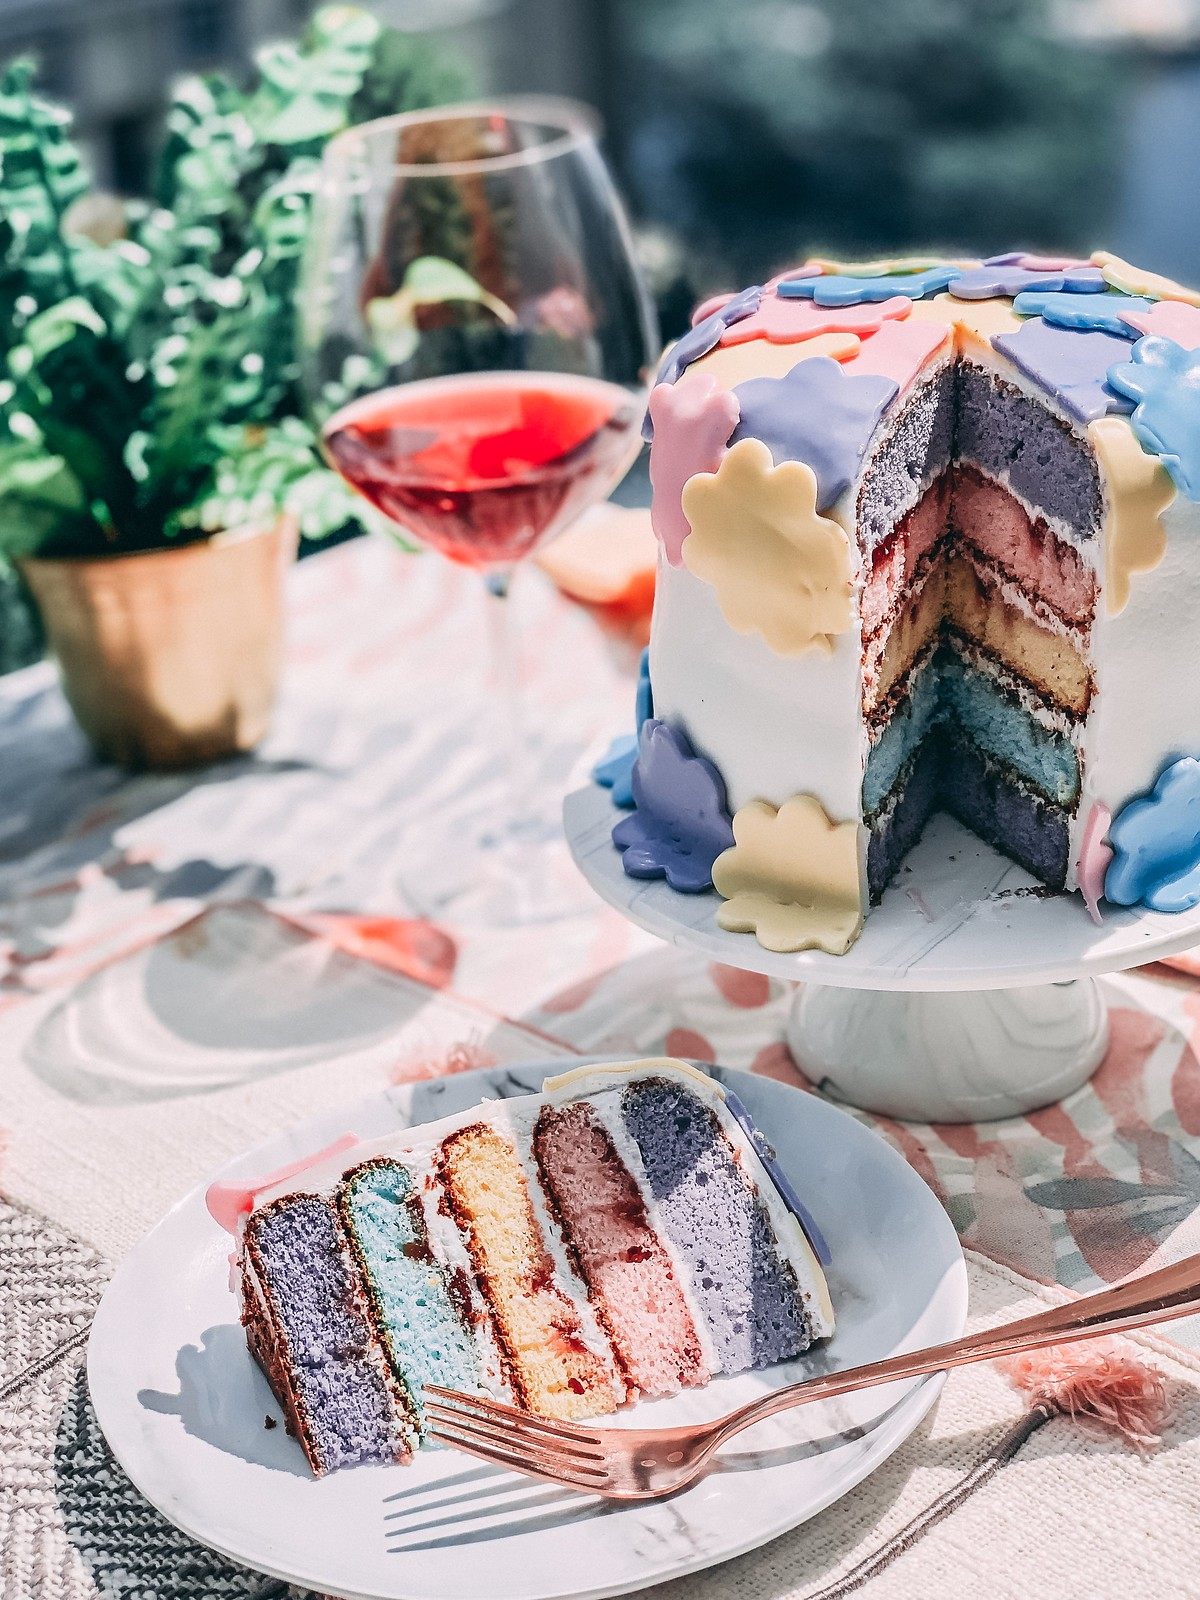 Mi primer pastel